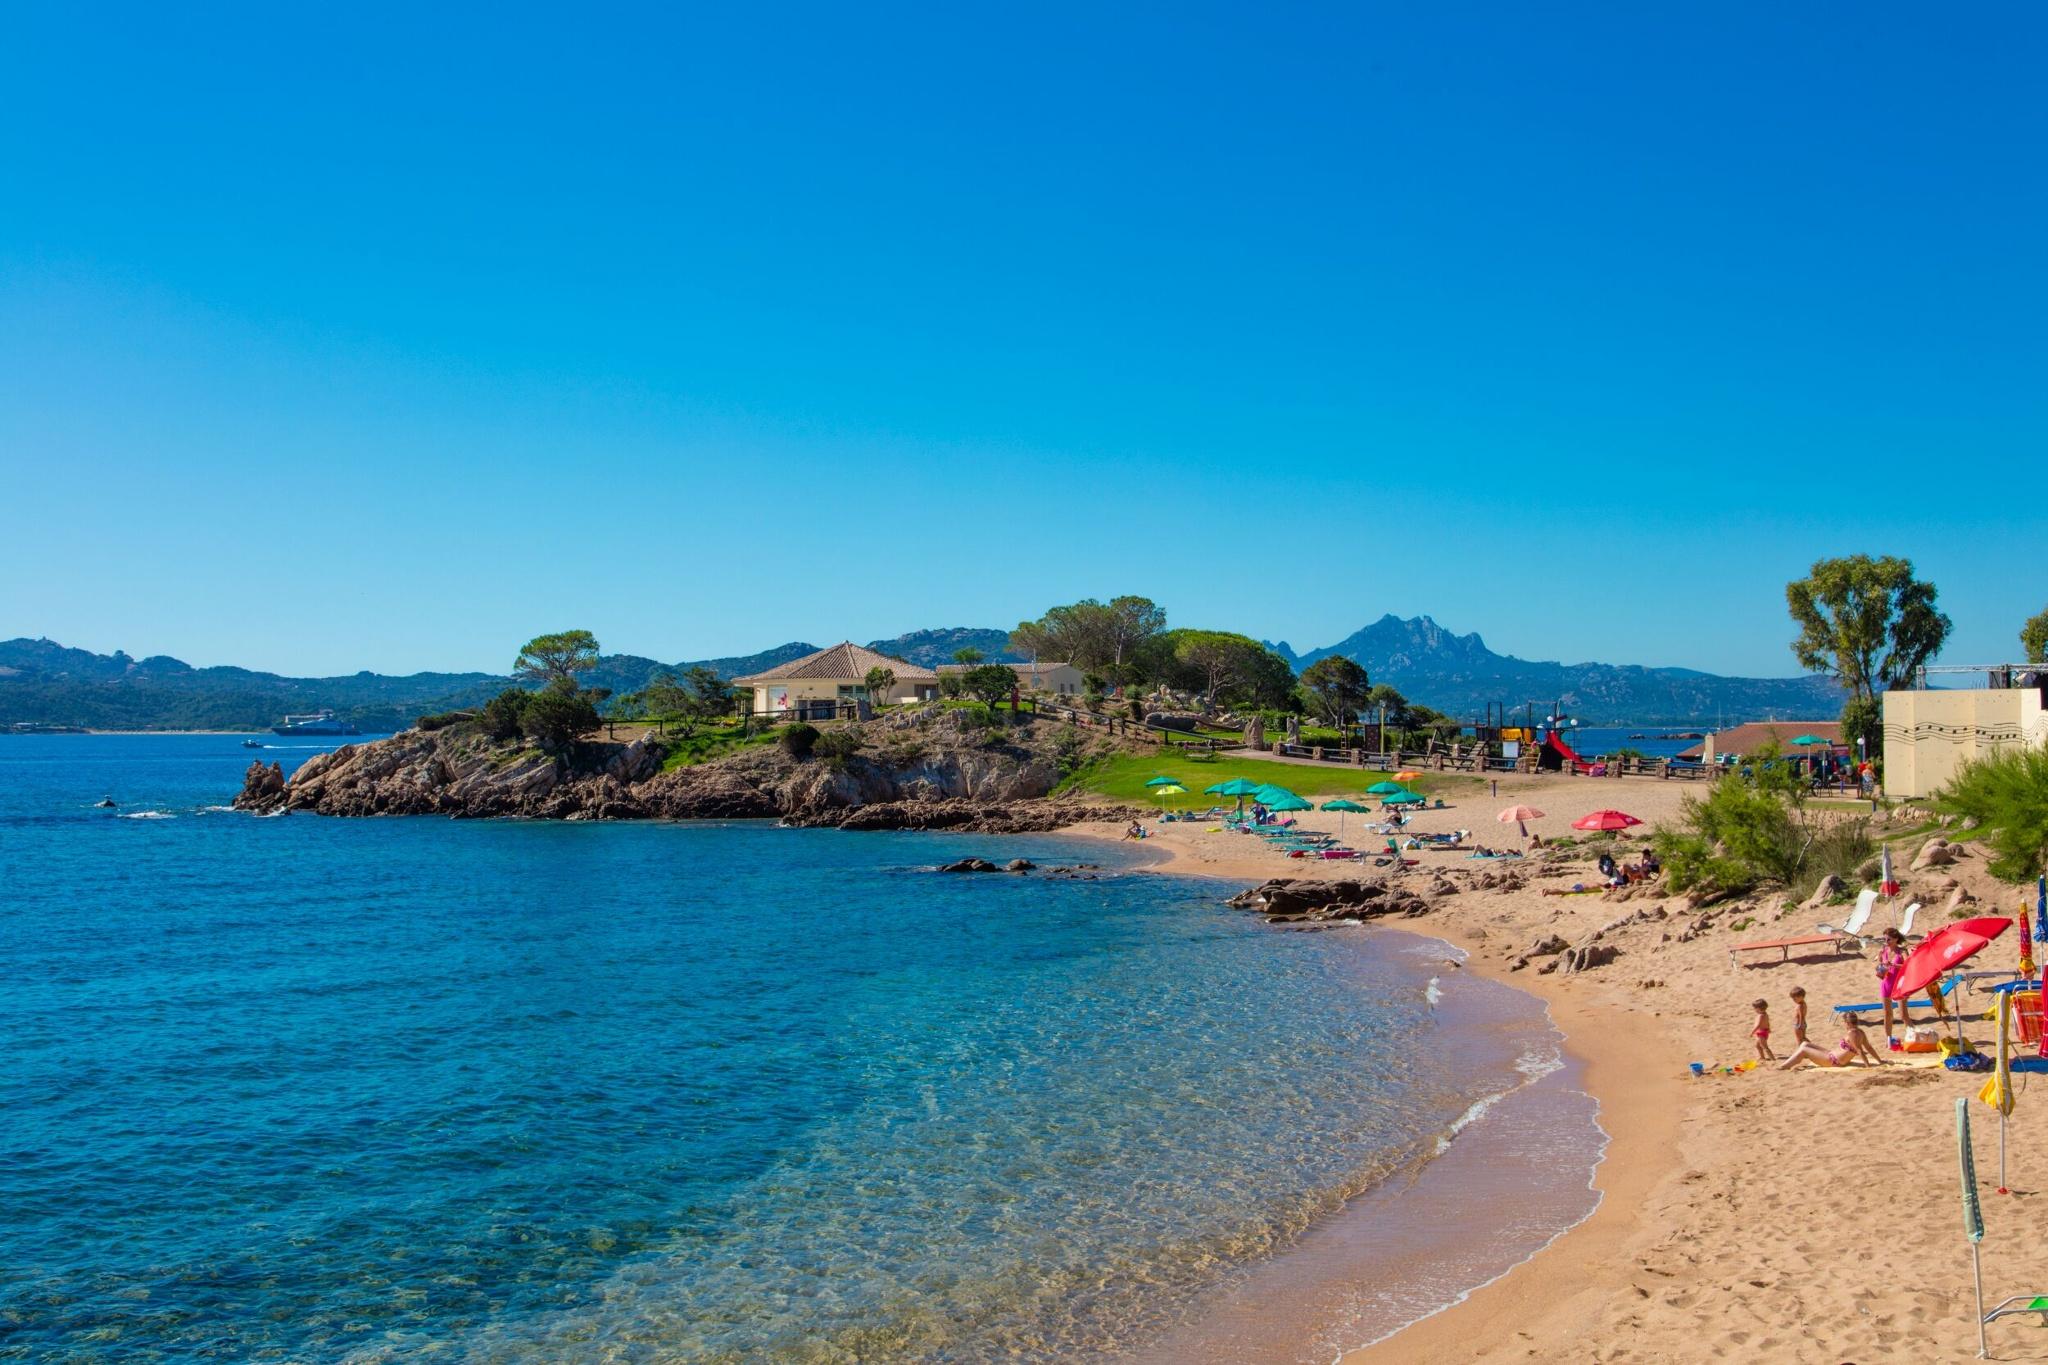 Isuledda-Italien-Strand-Camping-Gebetsroither